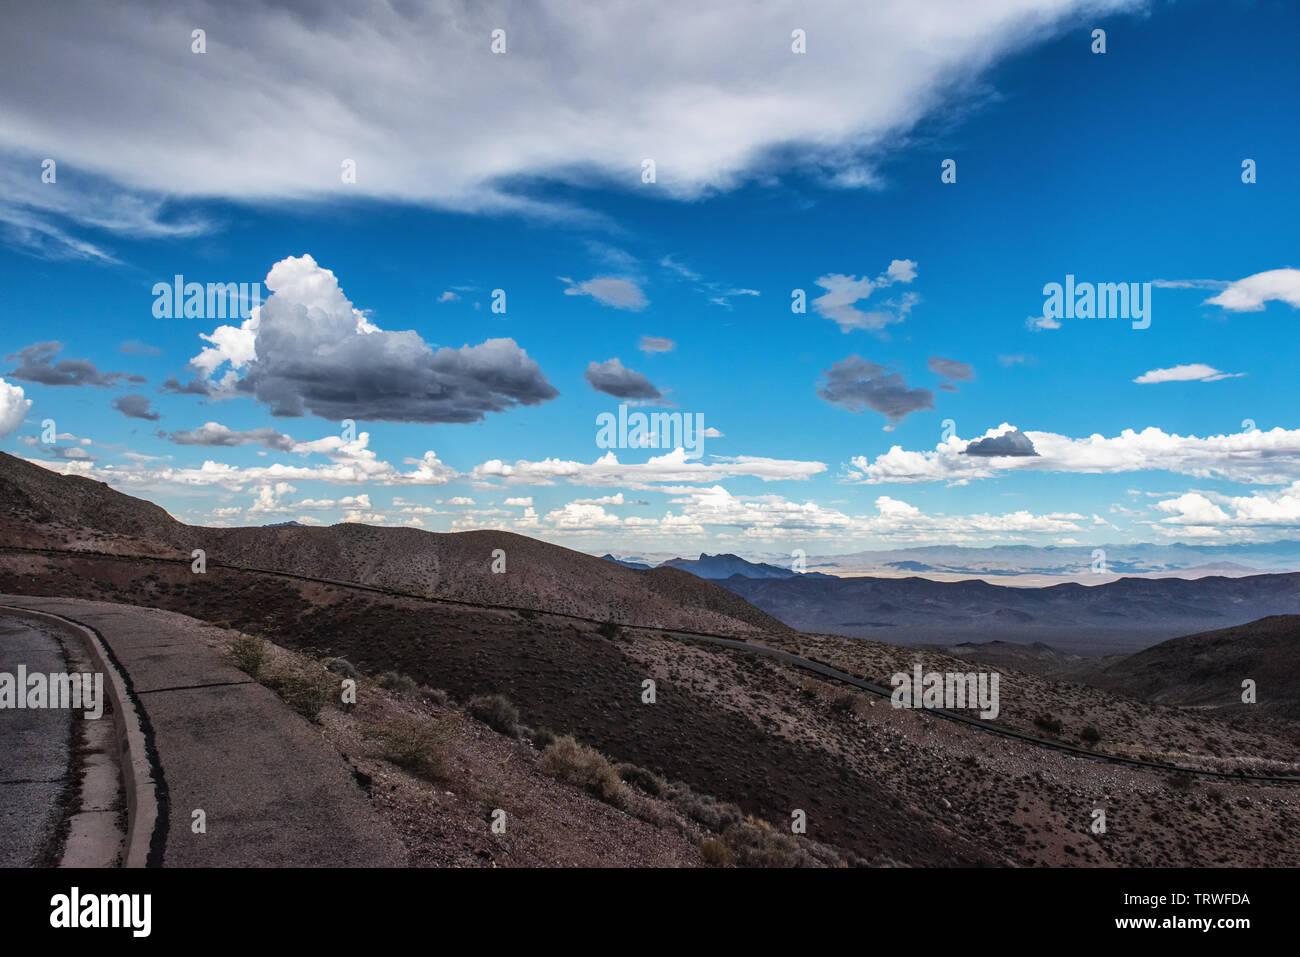 Death-Valleey-Nationalpark,Mojave-Wüste,USA,Sierra;Kontrastlandschaft Nevada,California,Nevada,desert,USA - Stock Image